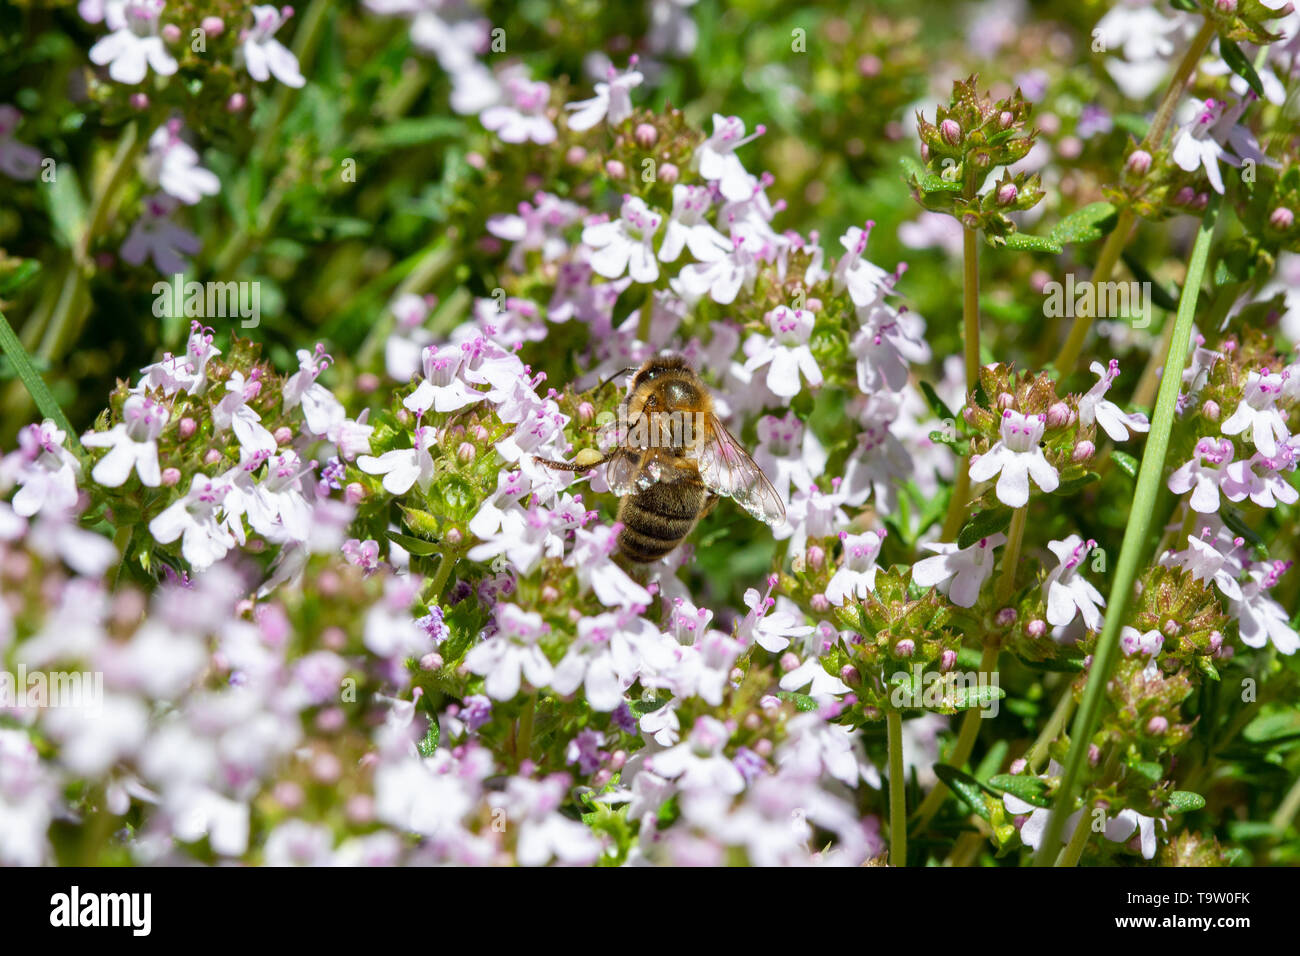 A Honeybee - Apis mellifera - feeding on the nectar of flowering Thym - Thymus vulgaris - on a sunny day in spring. - Stock Image